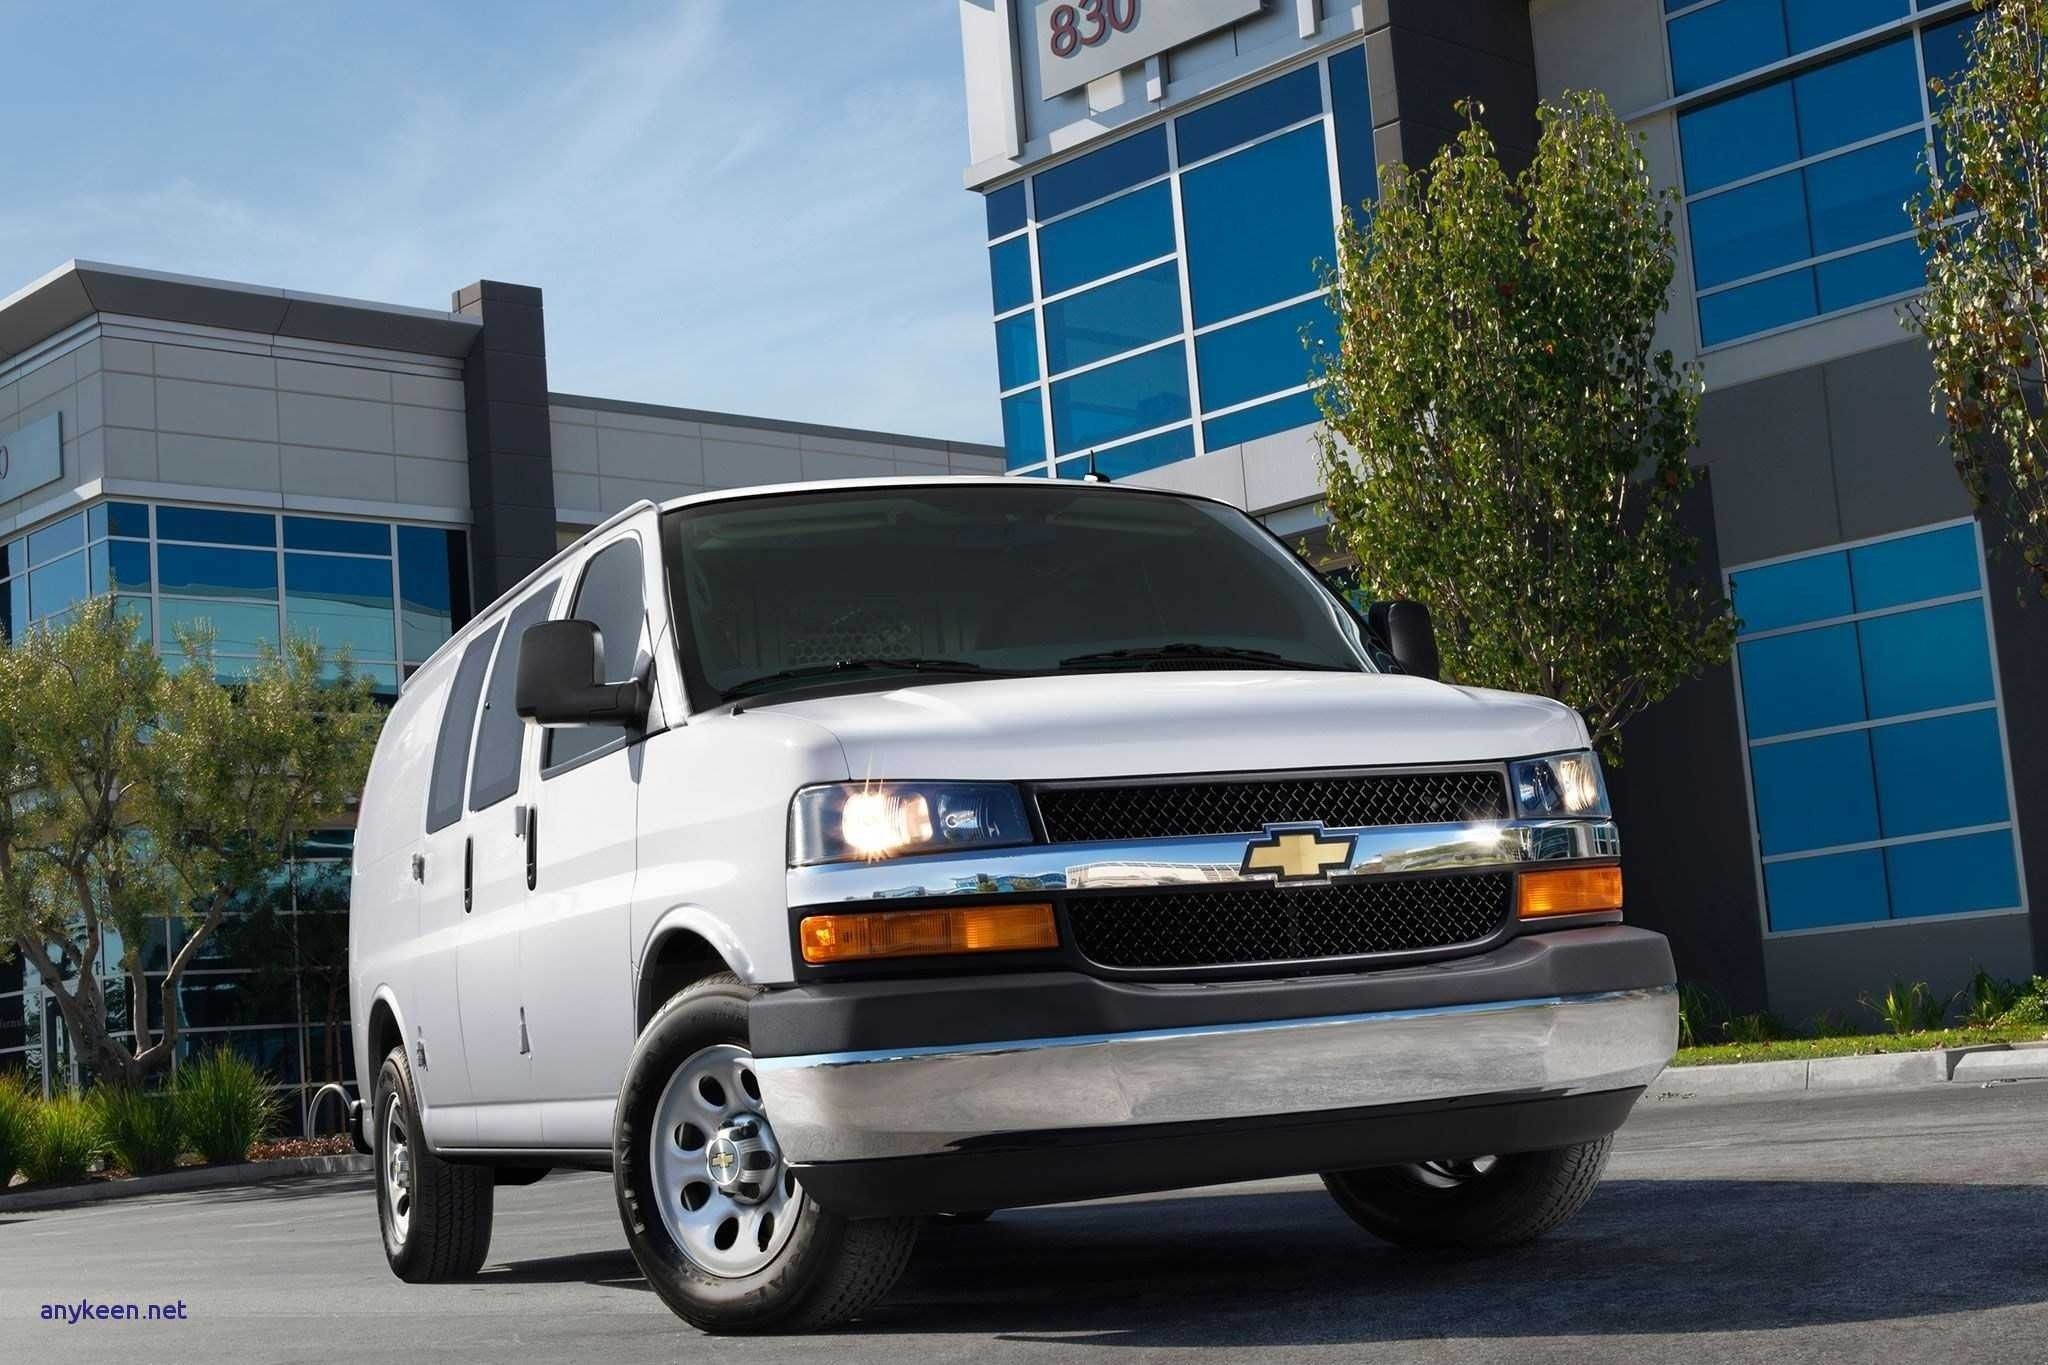 hight resolution of 2019 chevy express passenger van first drive car review 2018